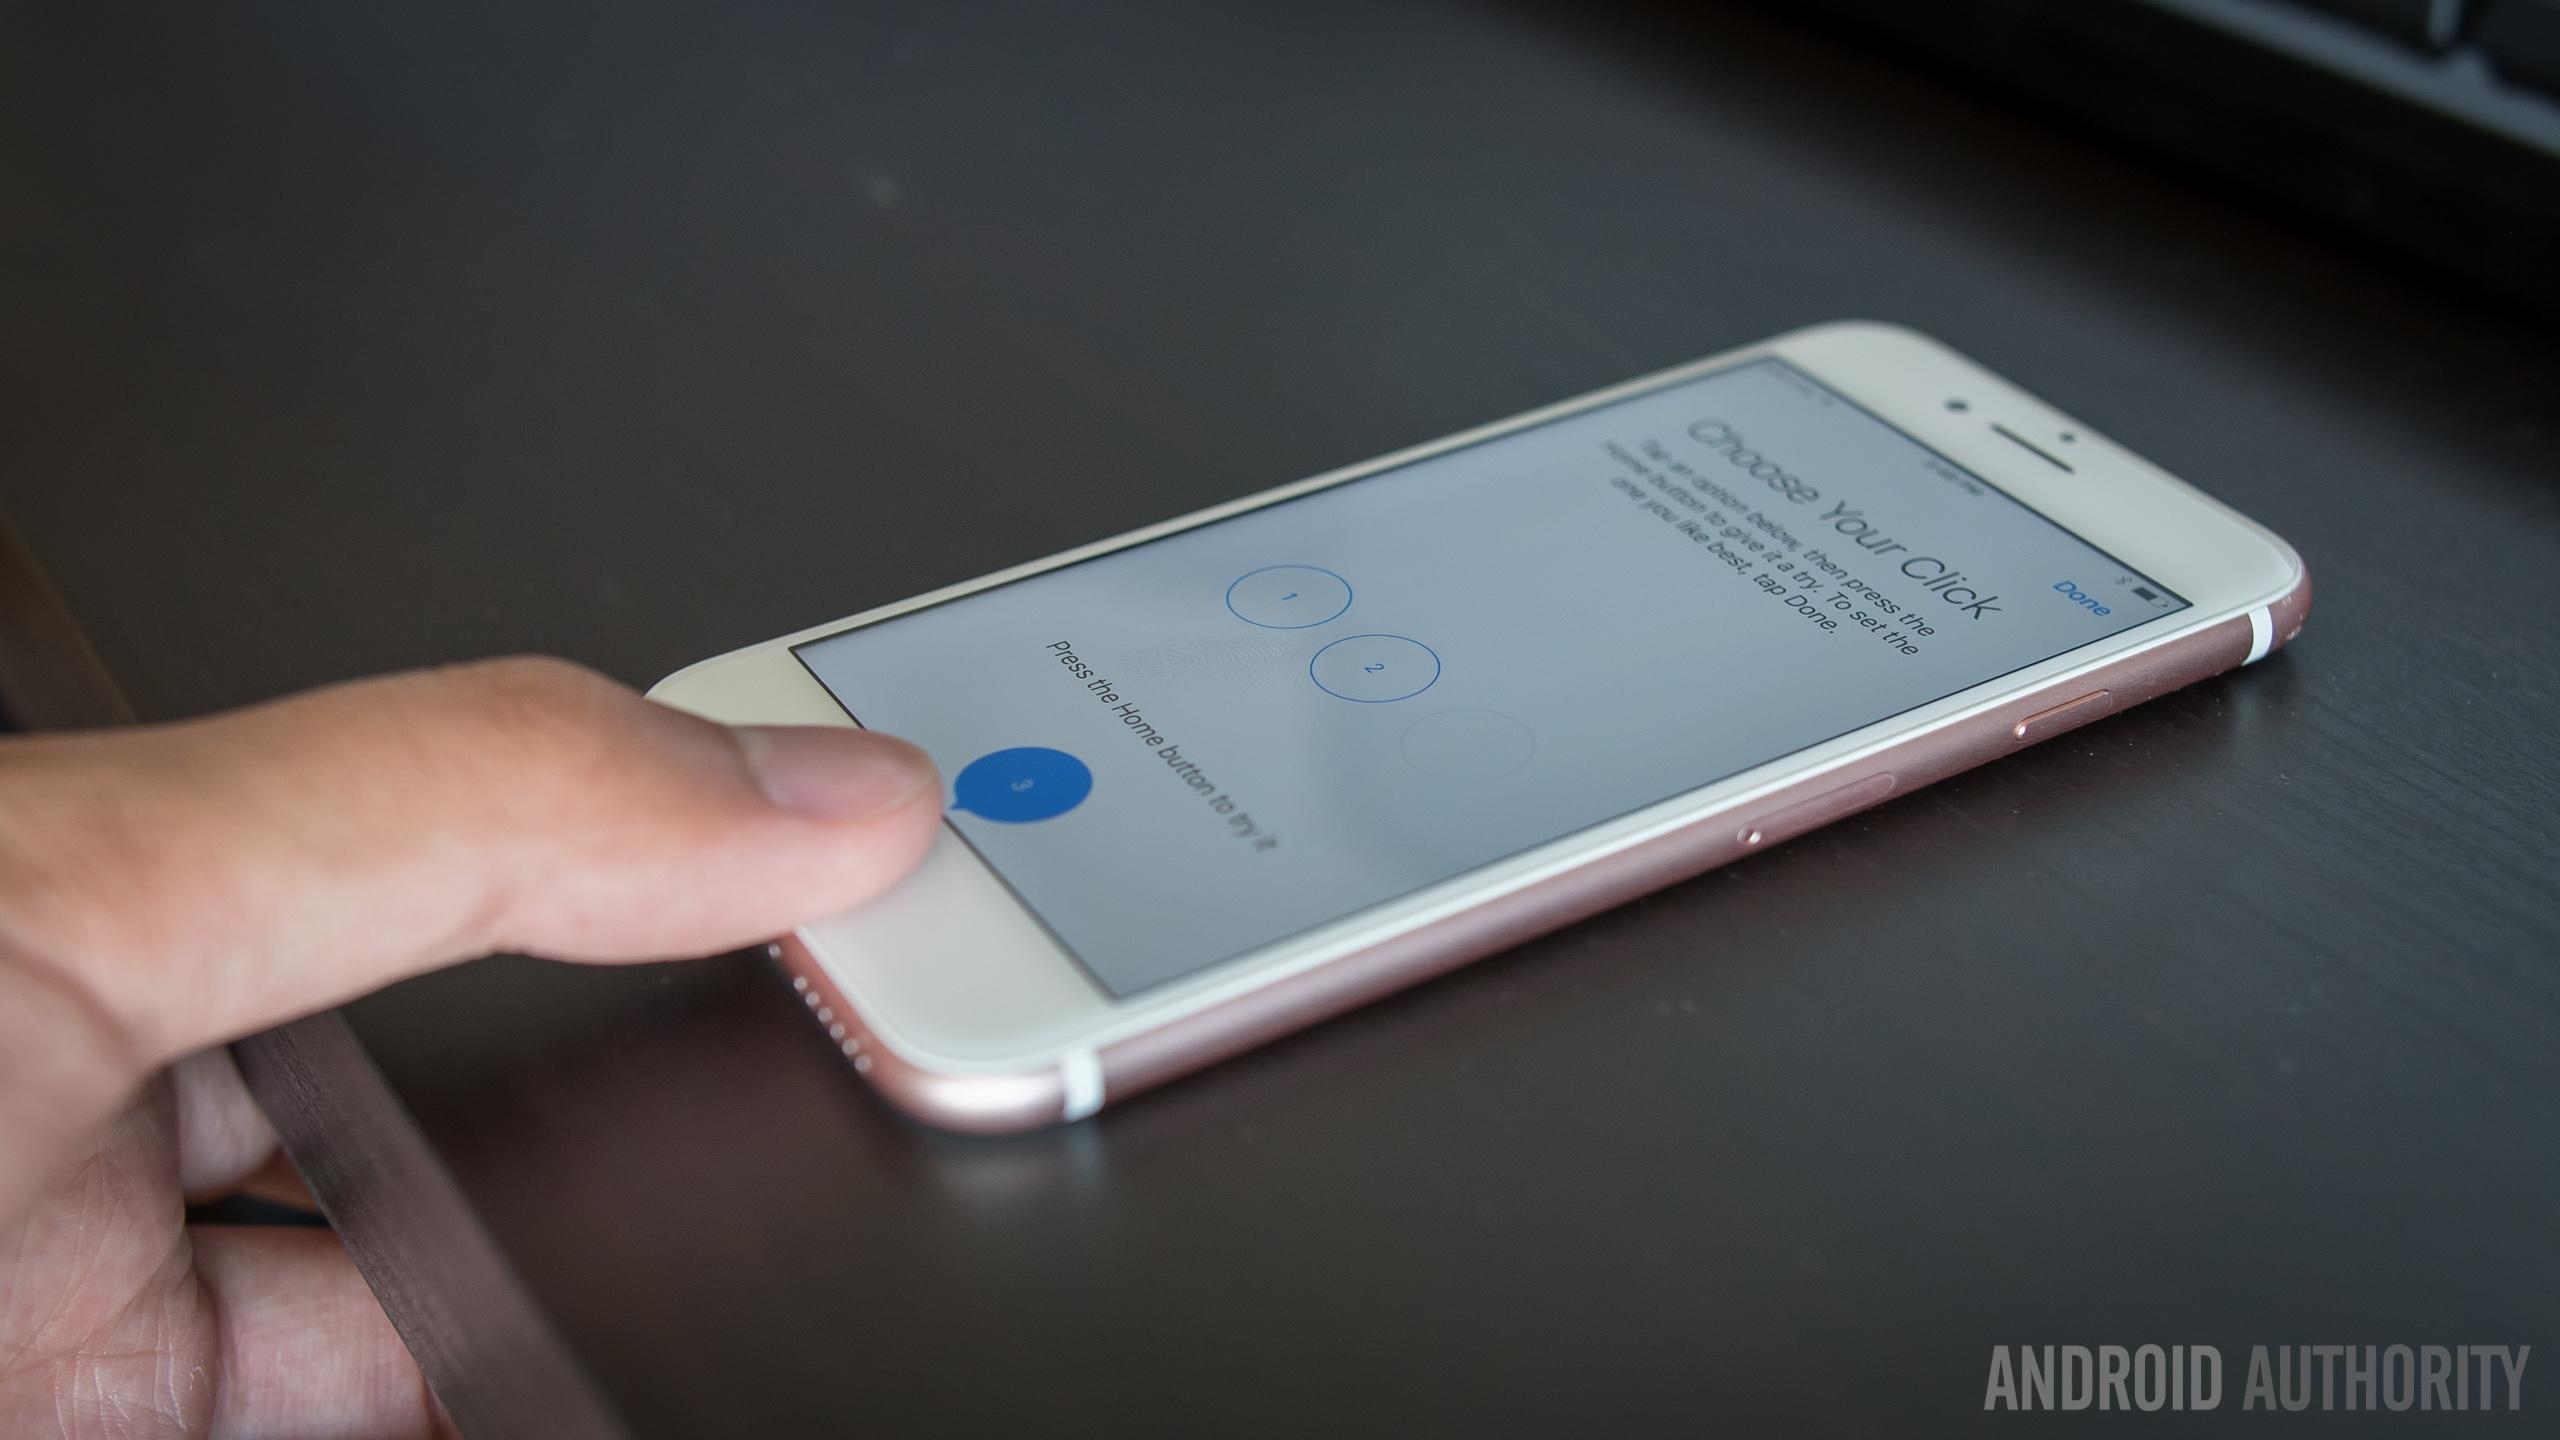 iphone 7 home button haptic feedback aa (6 of 9)